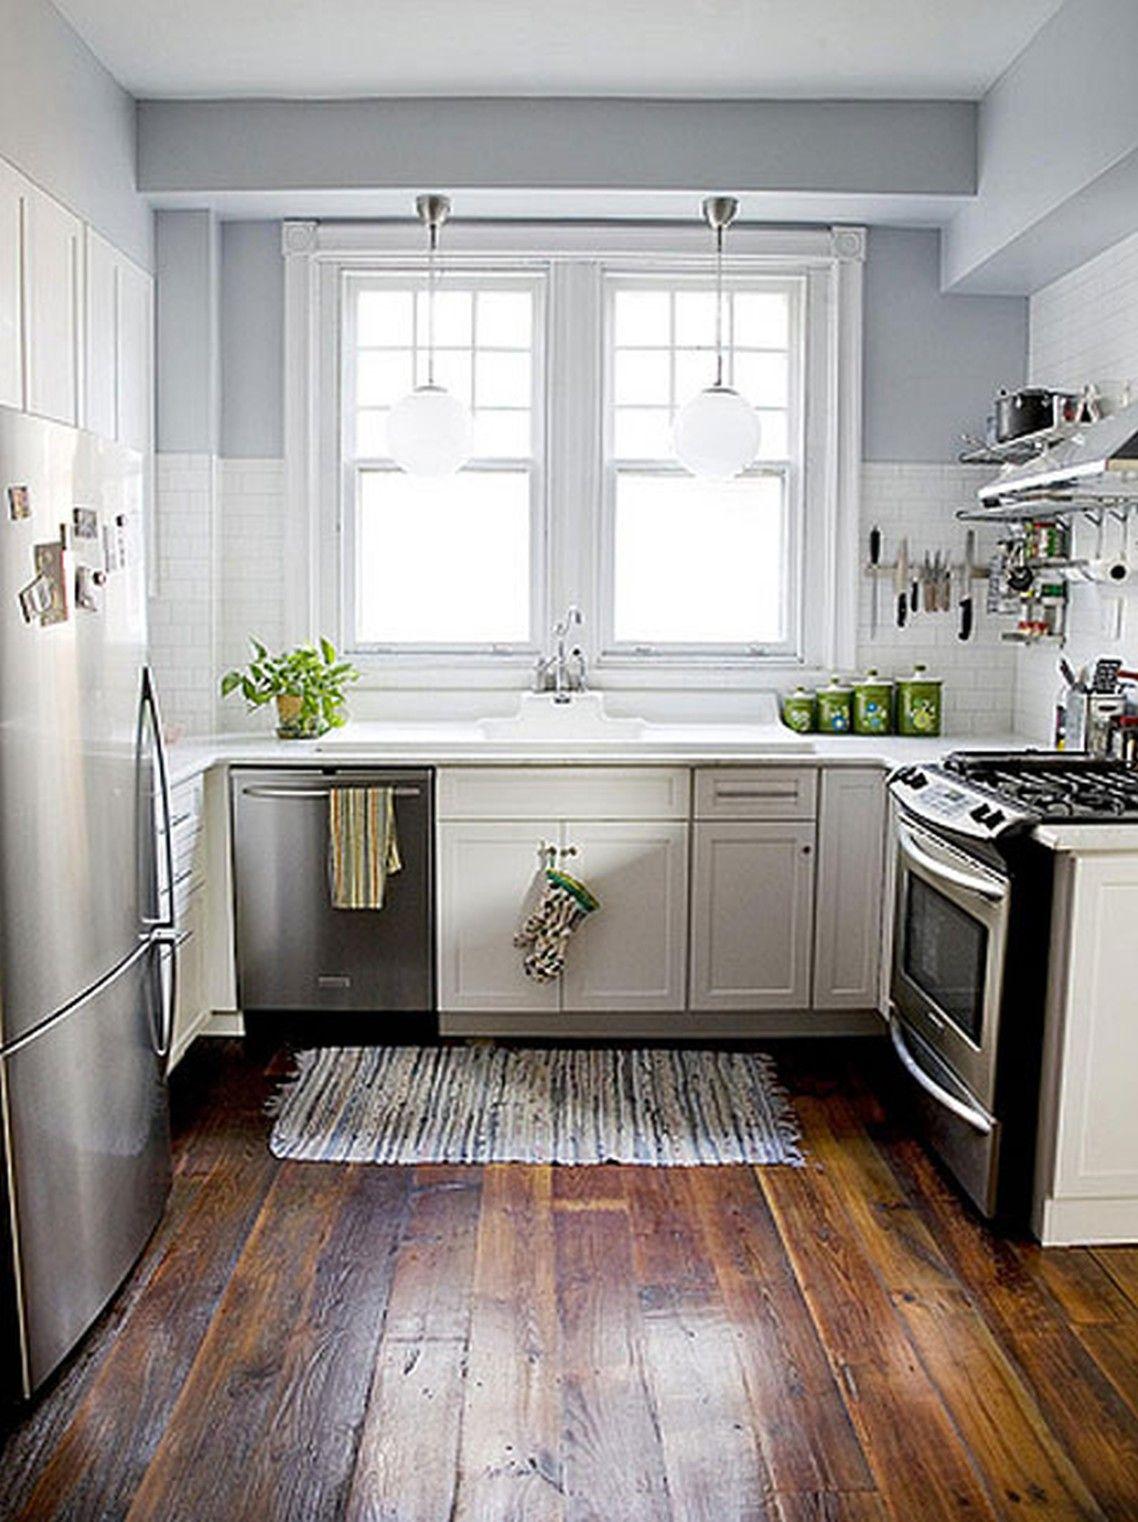 Ravishing Small Kitchen Storage Ideas Ikea Design With ...